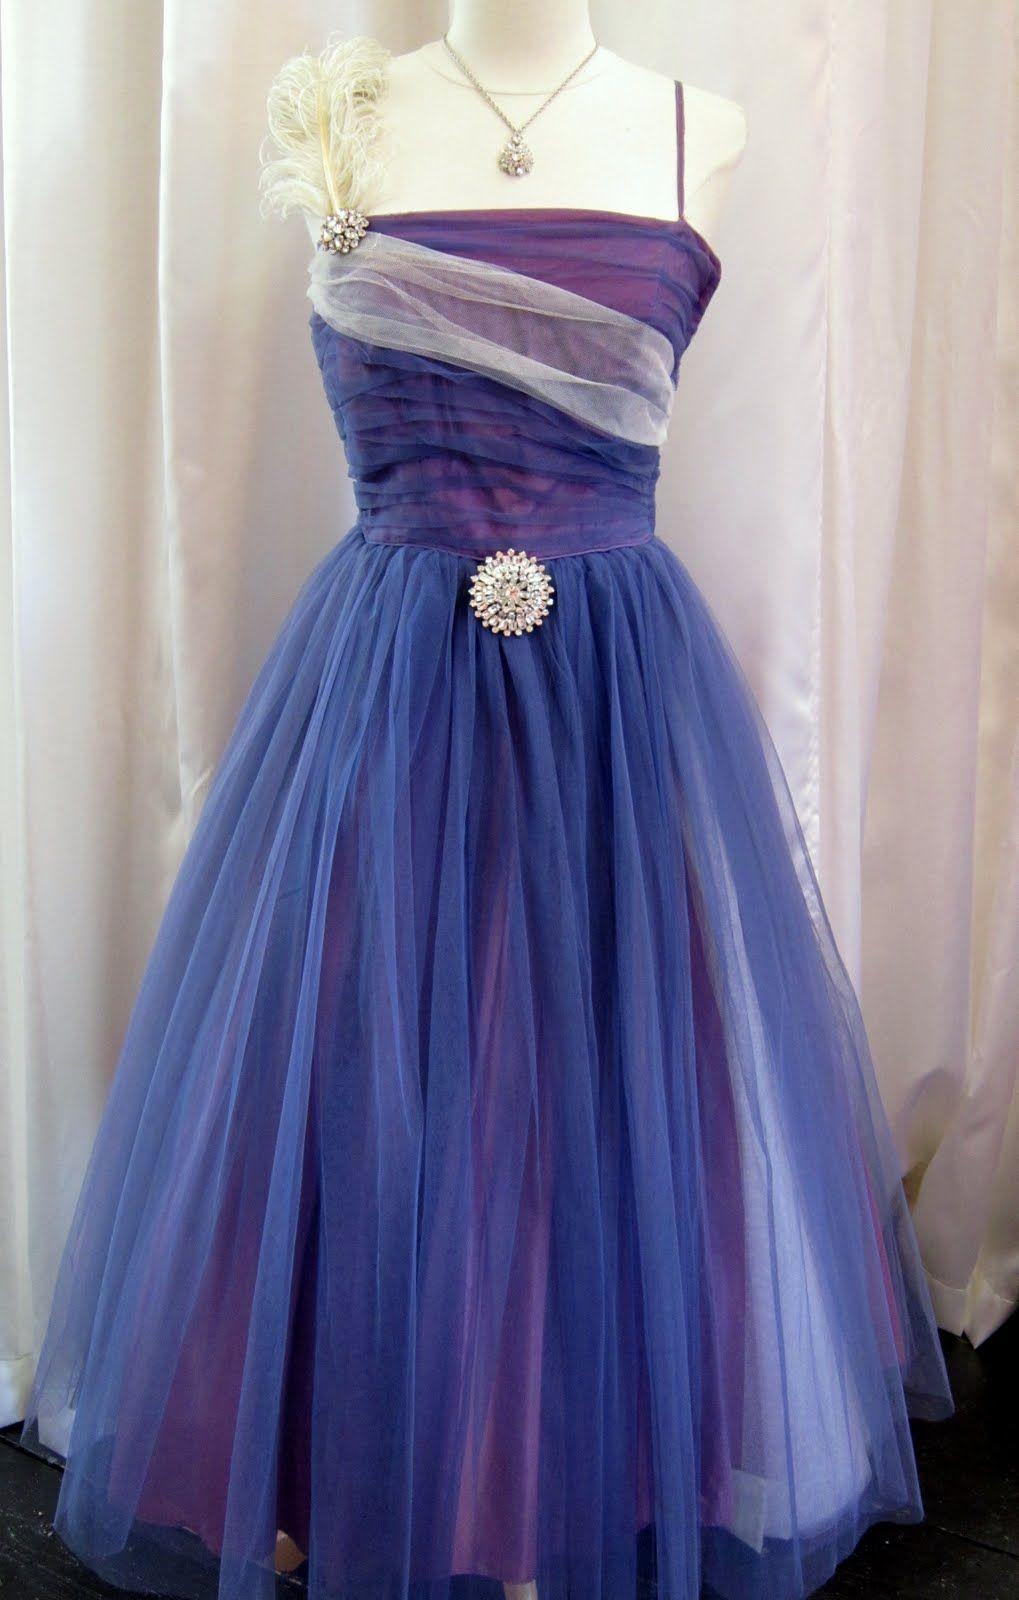 Us prom dress dress pinterest prom s and overlays